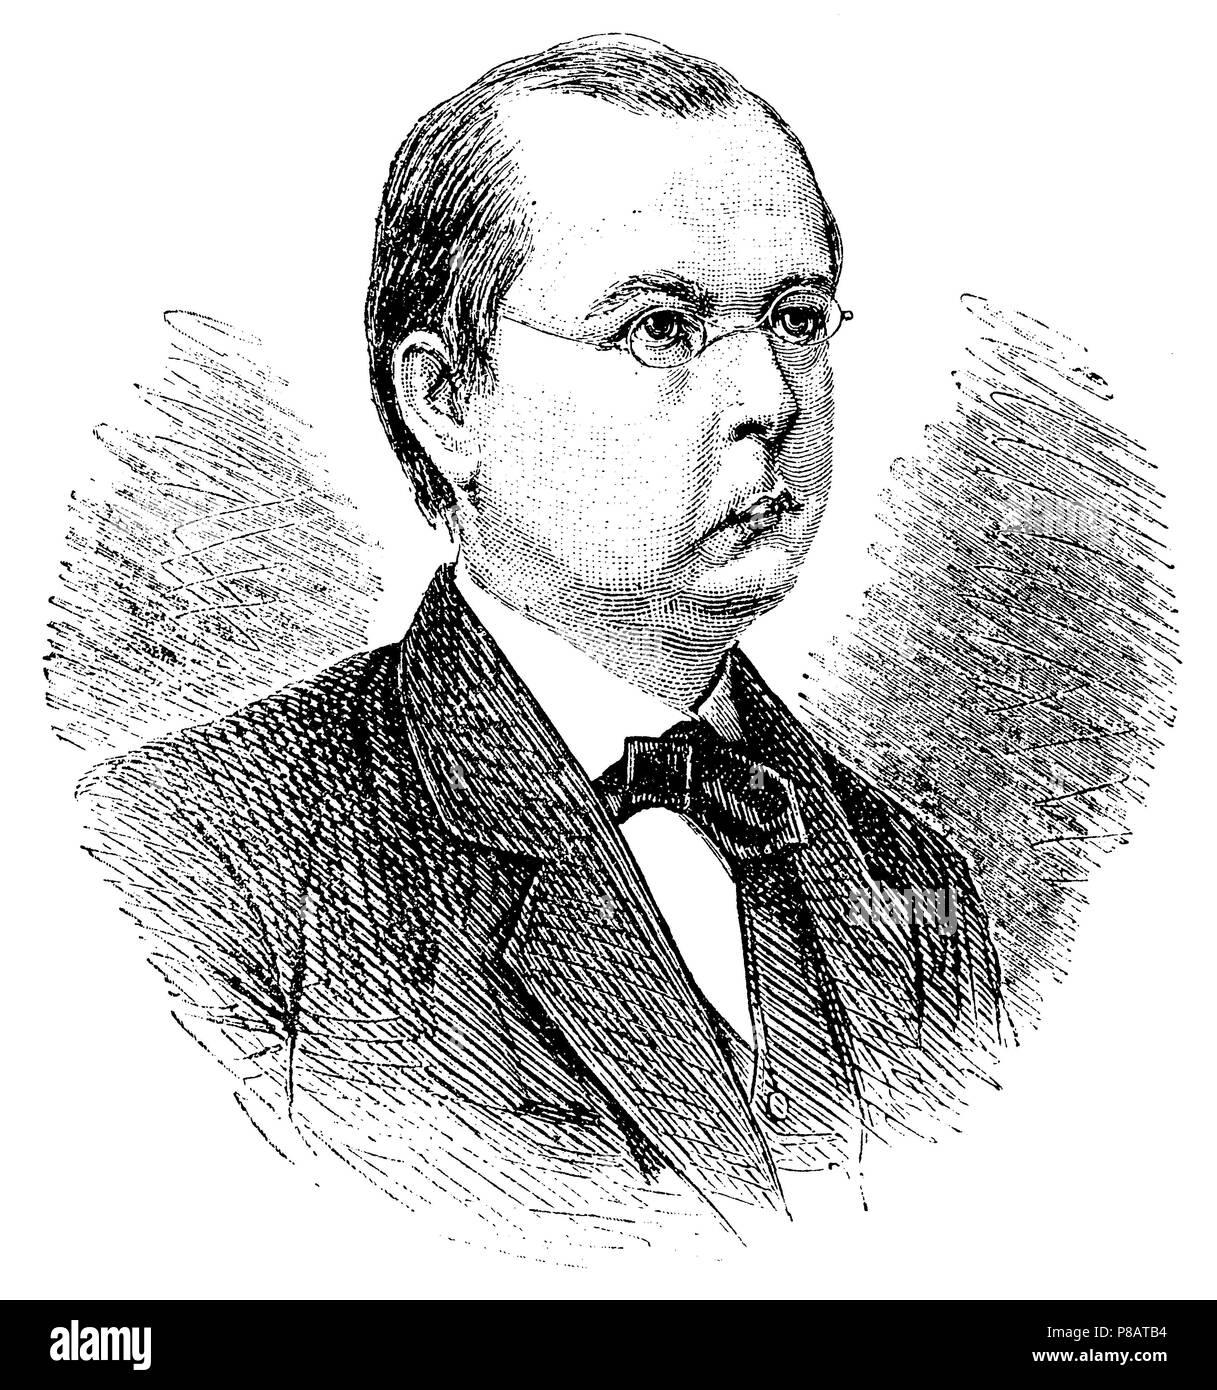 Zöllner, Karl Friedrich <1834-1882> German physicist, astronomer and spiritualist, - Stock Image